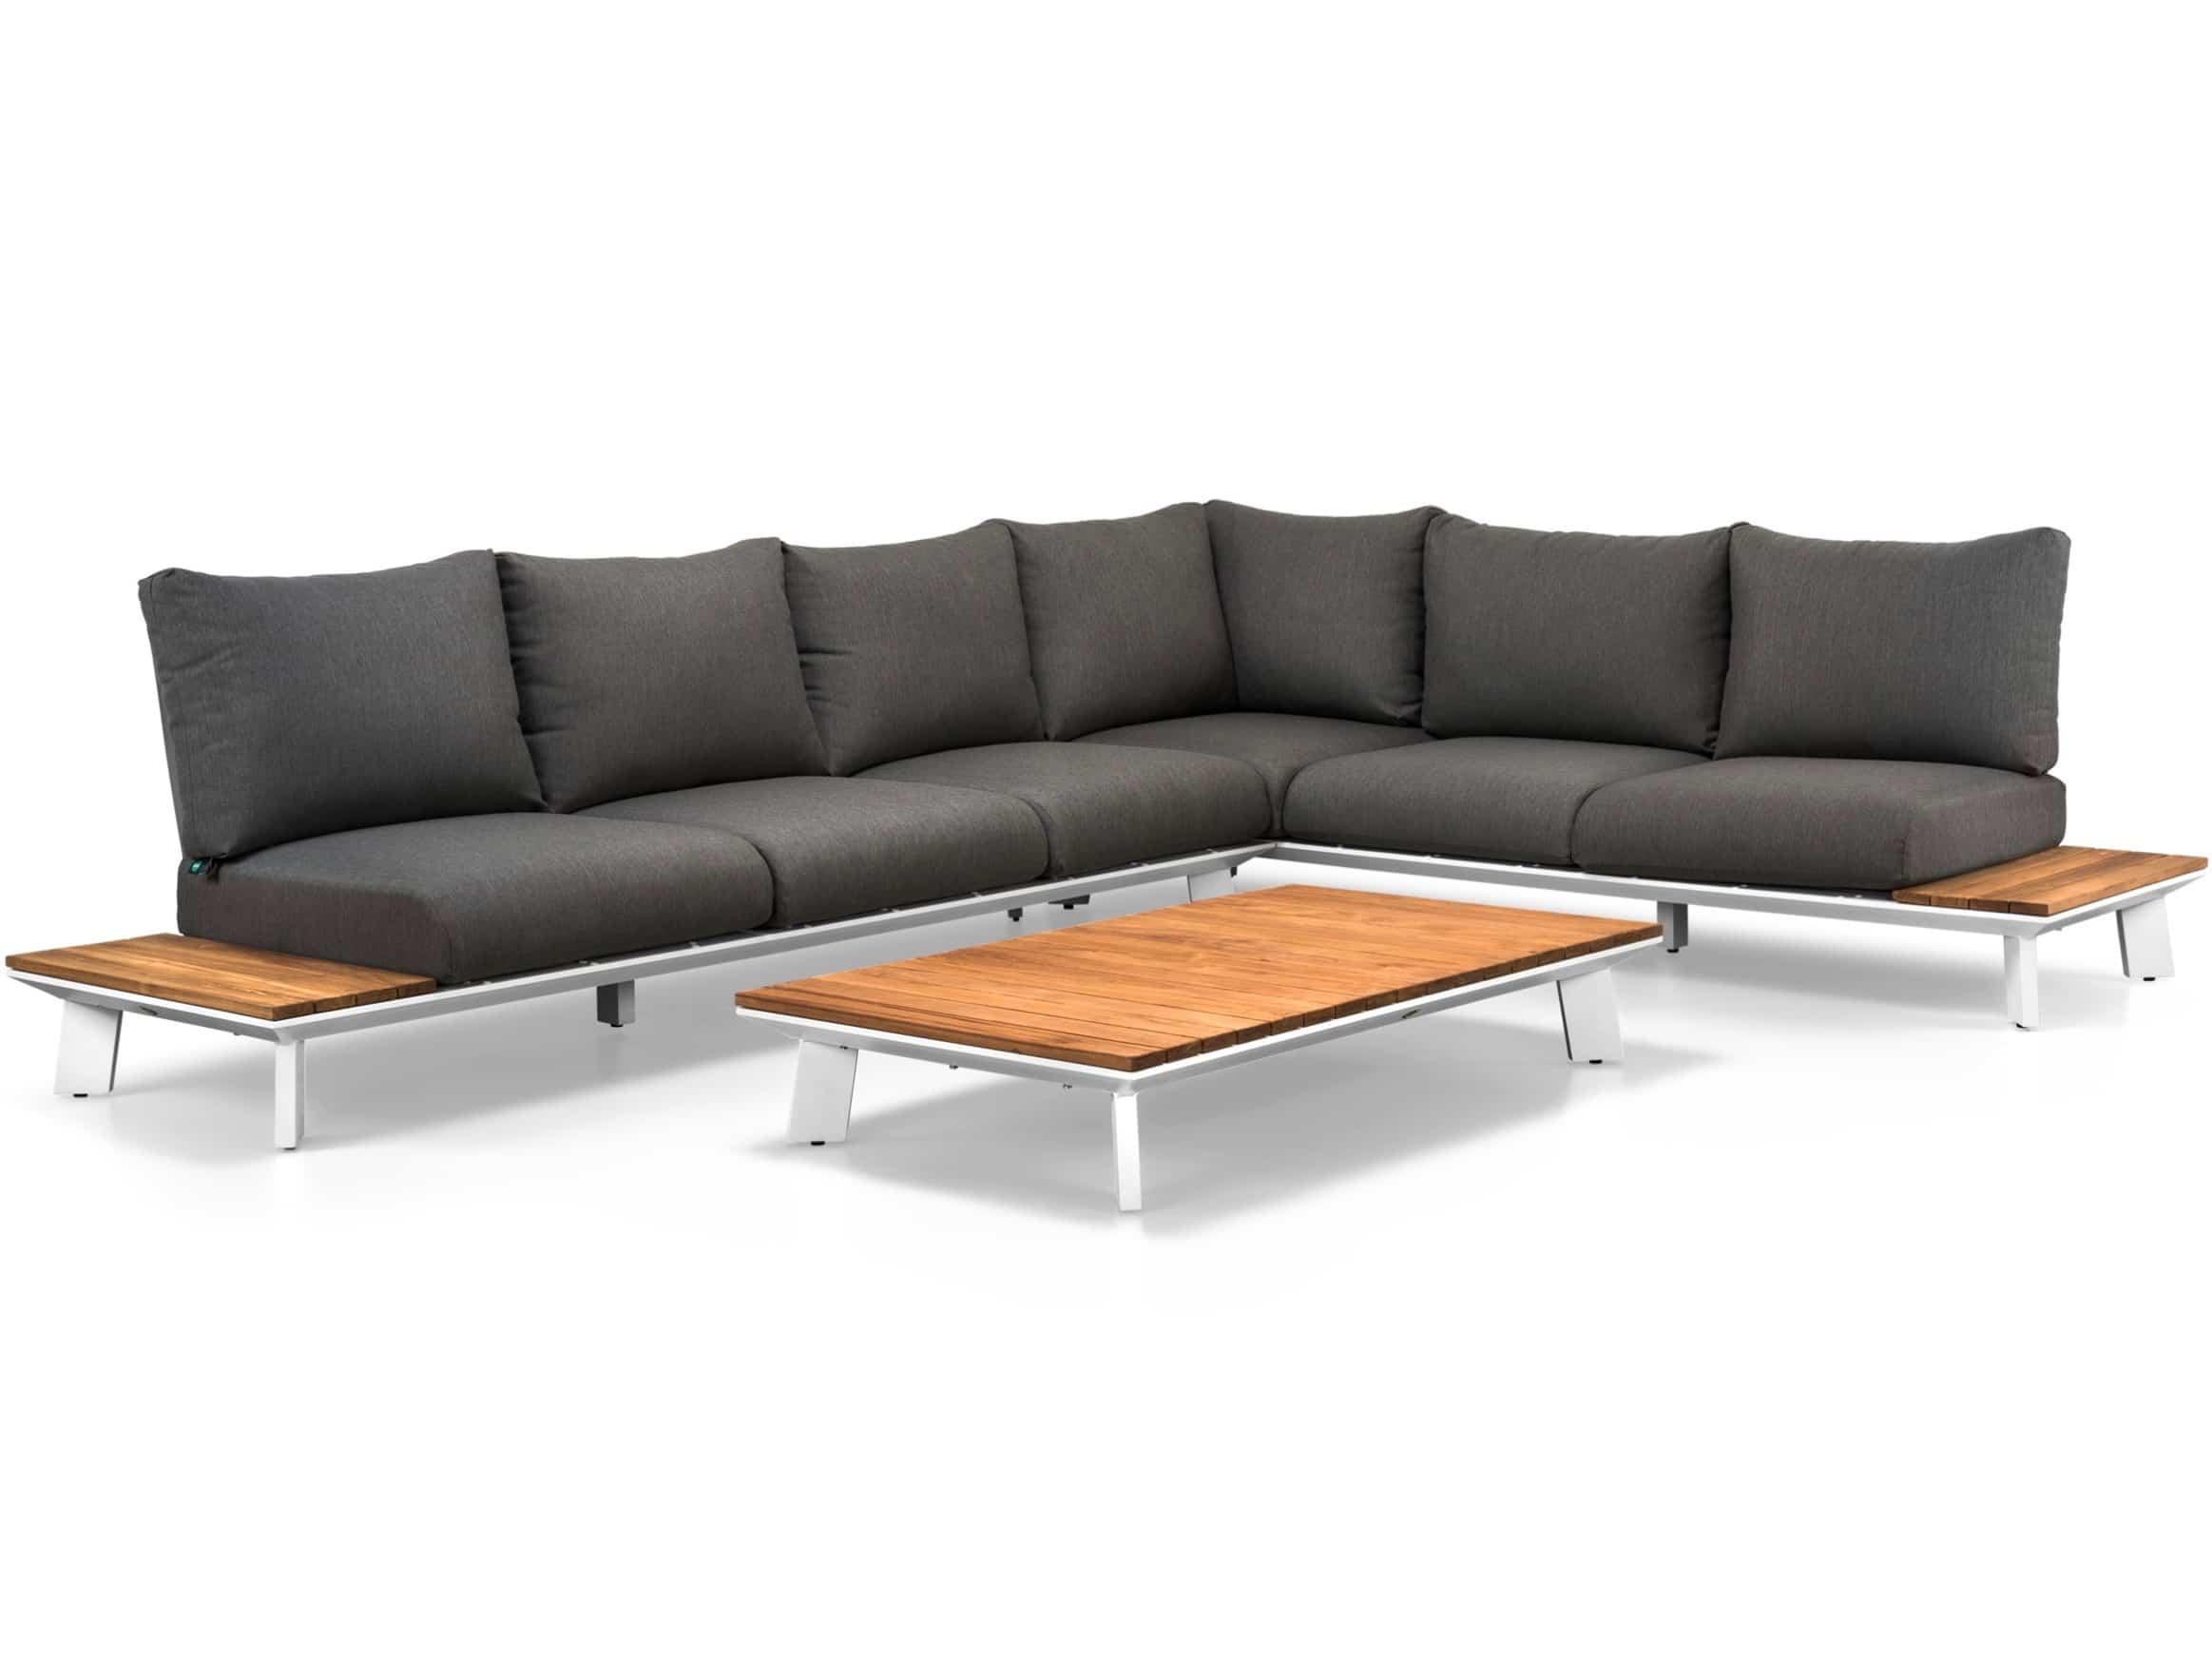 Kussen Wit 12 : Denver hoek loungeset 3 delig wit aluminium donker grijze kussens